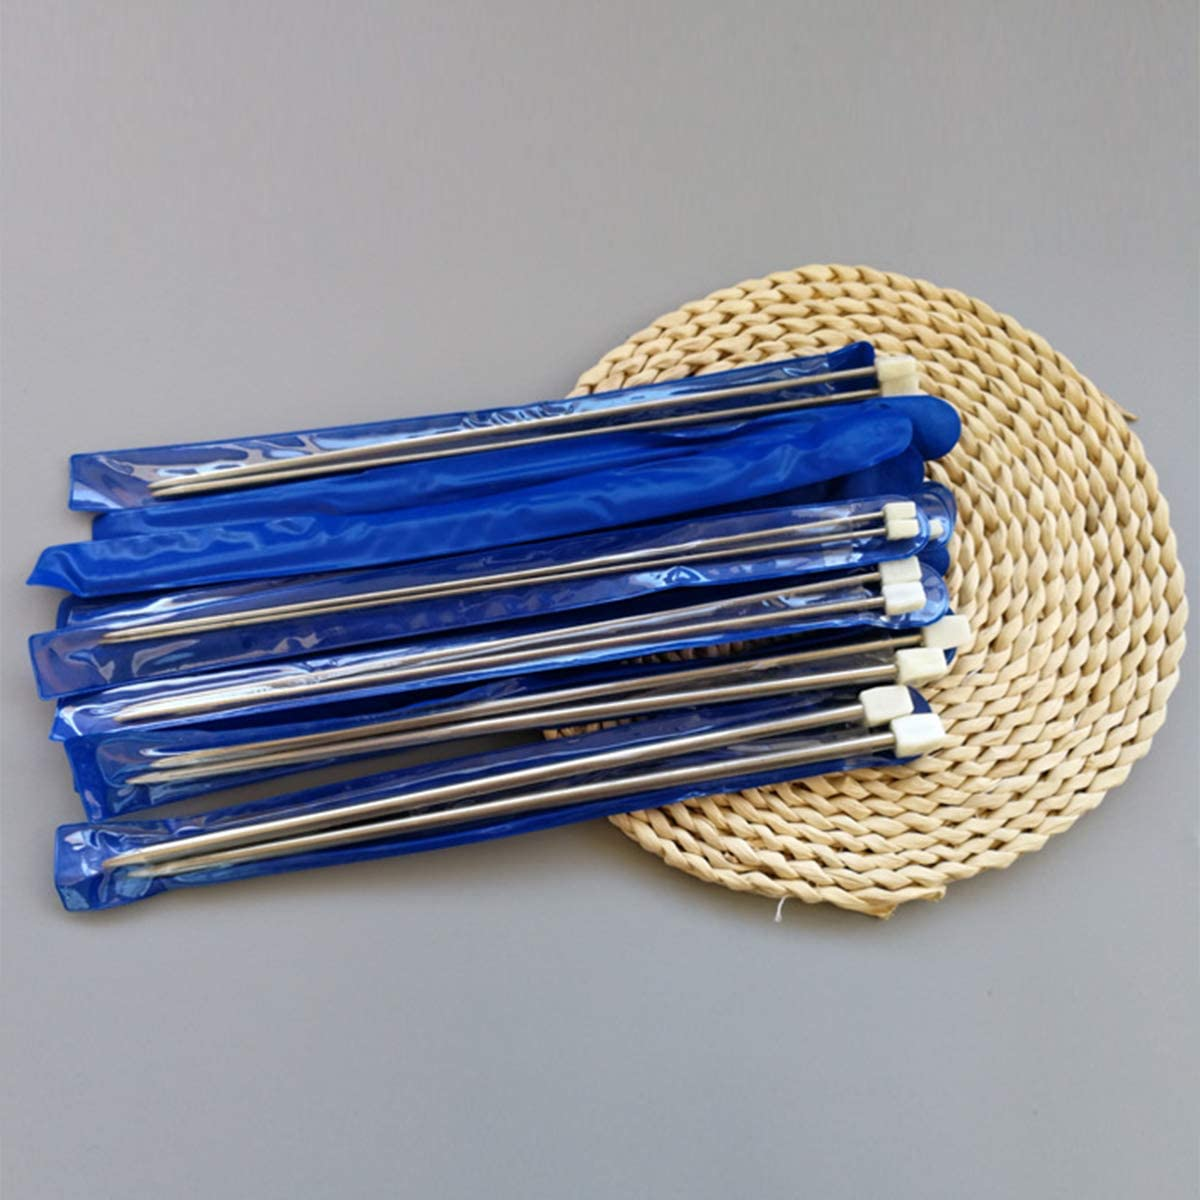 11 paia di ferri da maglia in acciaio inox ferri dritti per maglieria in diverse misure Ferri da maglia ferri da maglia circolari lunghezza 36 cm